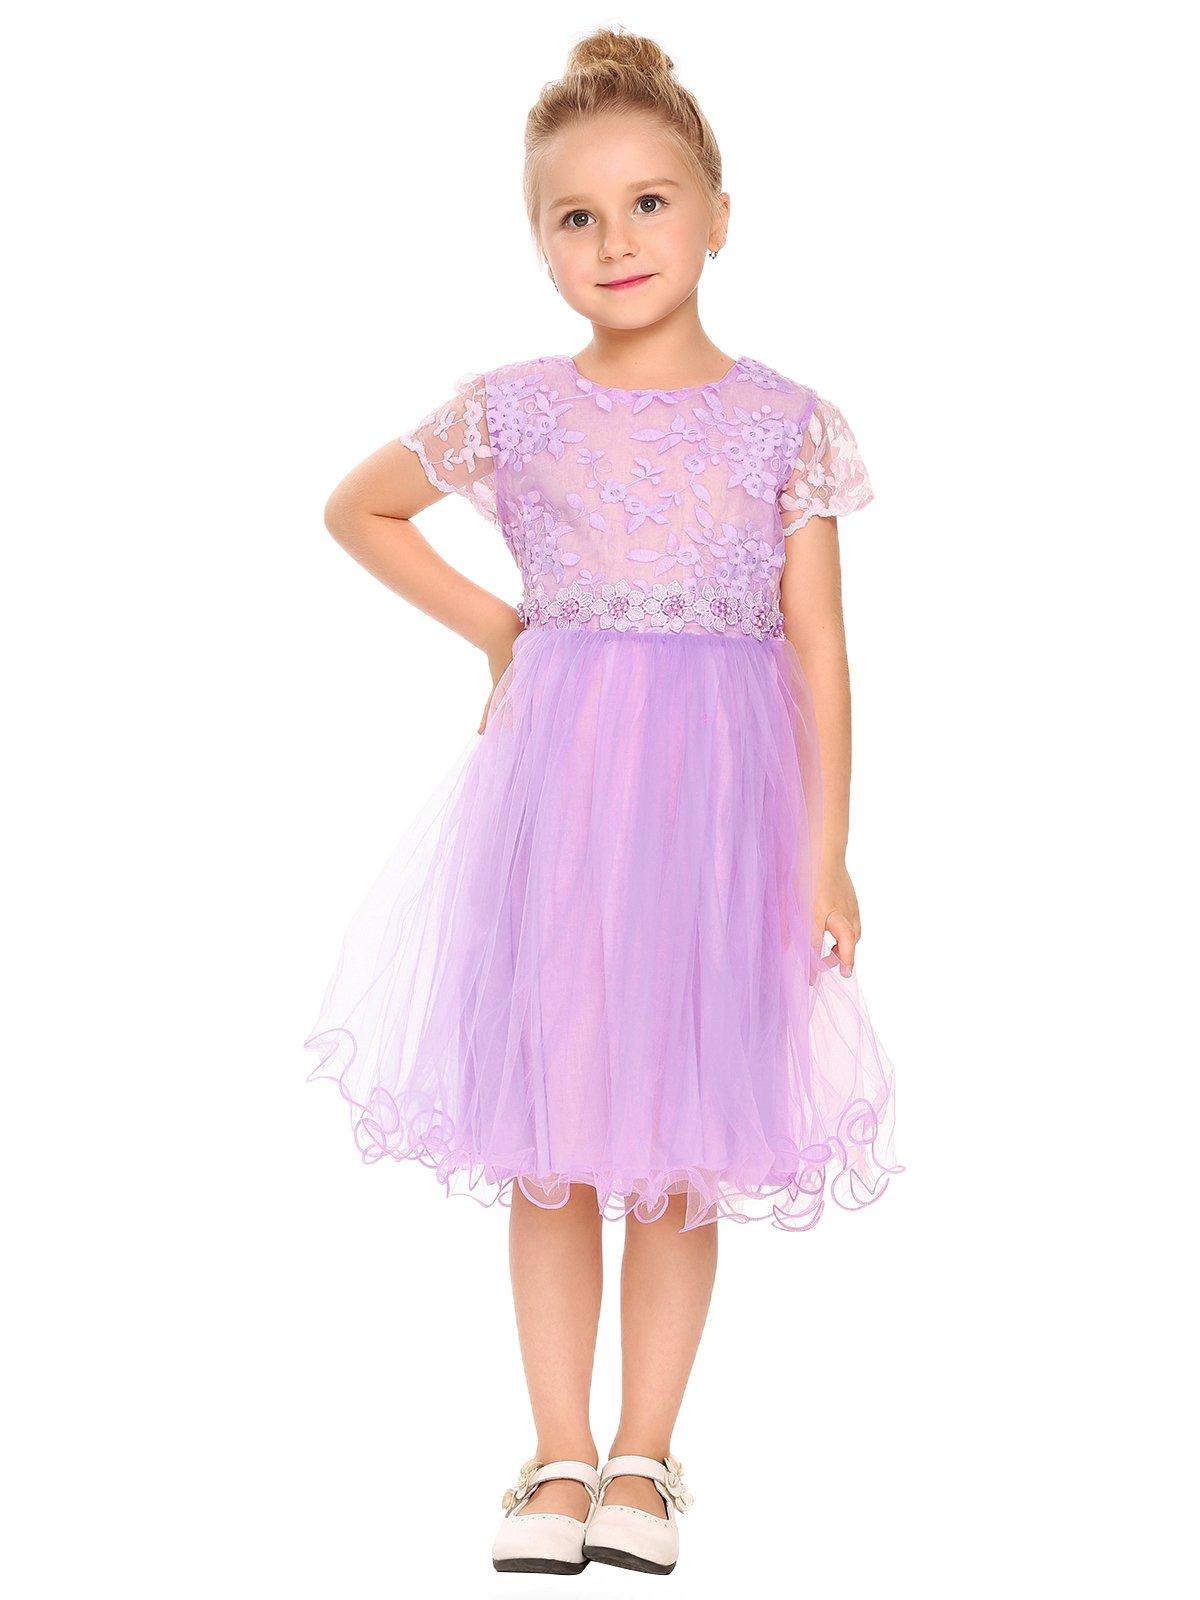 Arshiner Girls Lace Dress Princess Party Tutu Dresses Violet 130